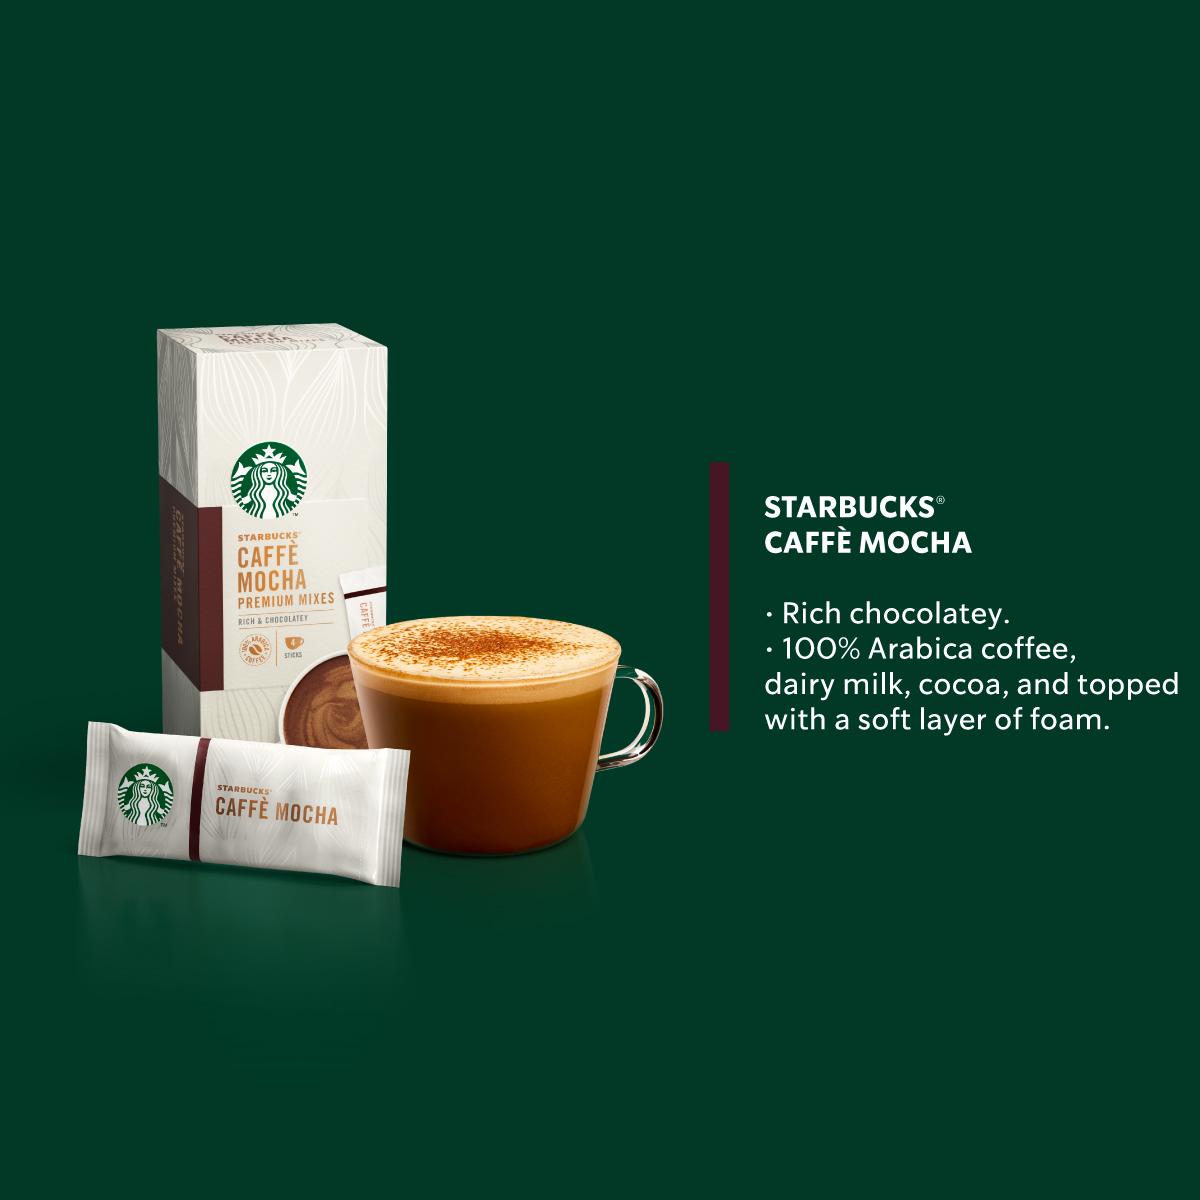 STARBUCKS Mocha and Latte Premium Instant (4x22g) x4 boxes, FREE Notebook